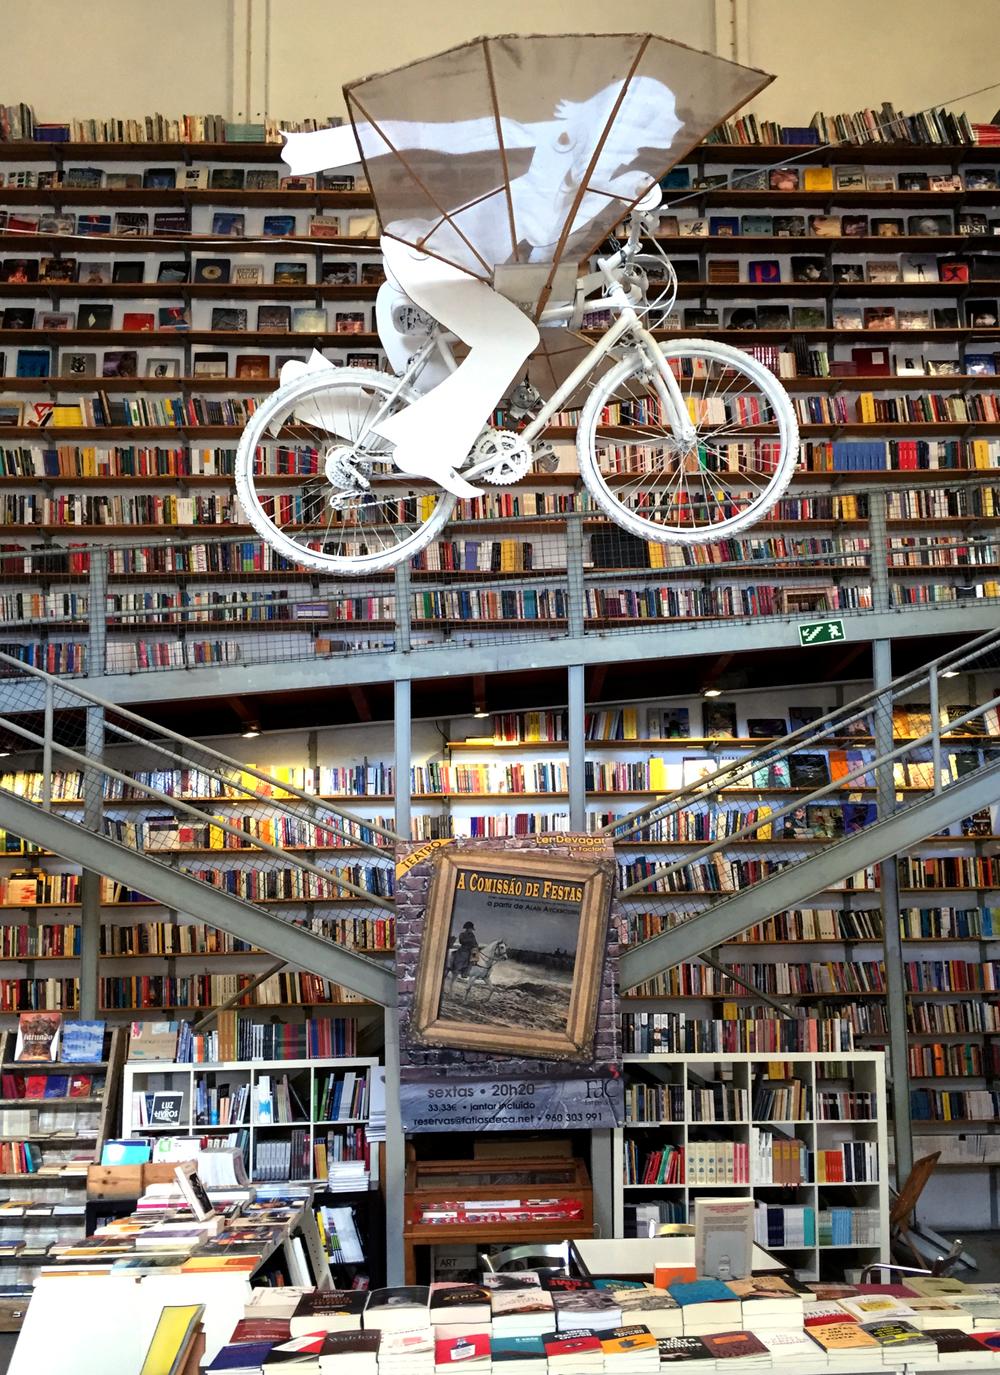 LXfactorybookstore.jpg